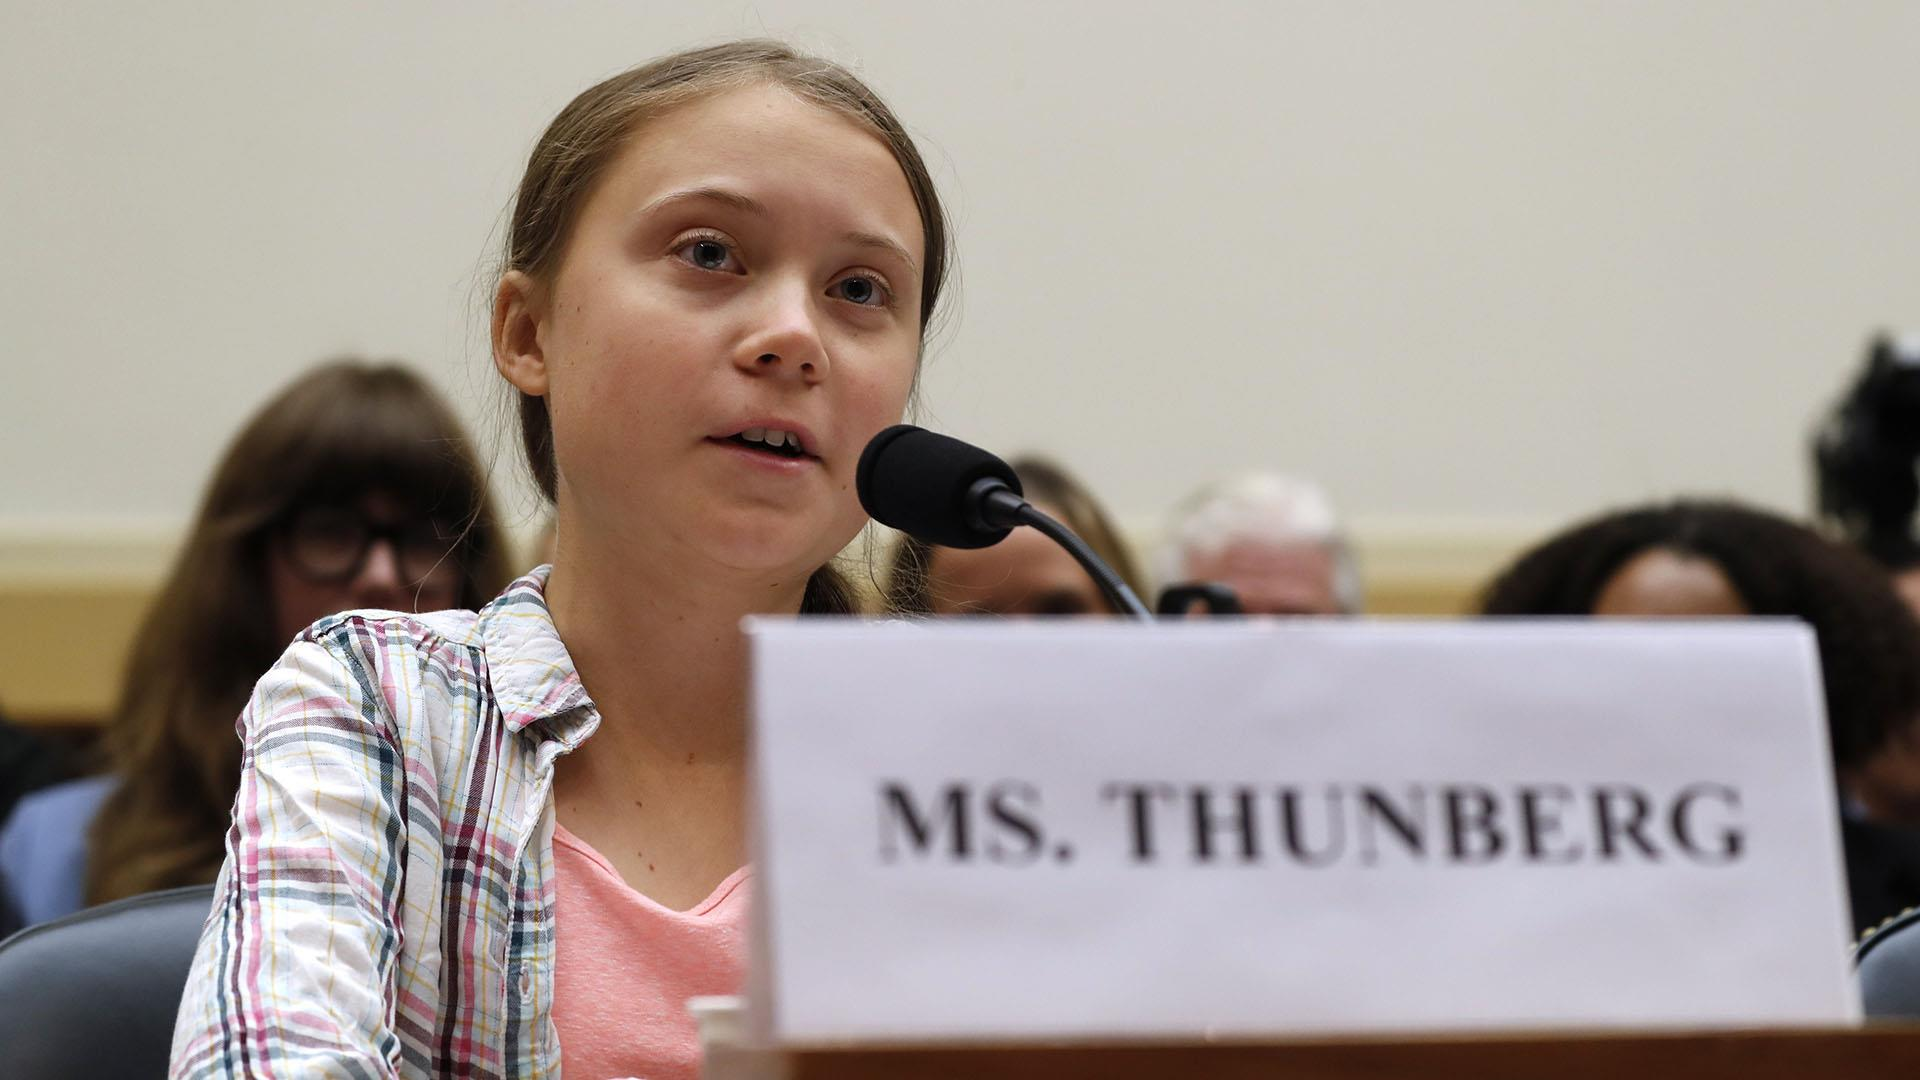 Teen climate activist Greta Thunberg tells Congress: 'Unite behind the science'